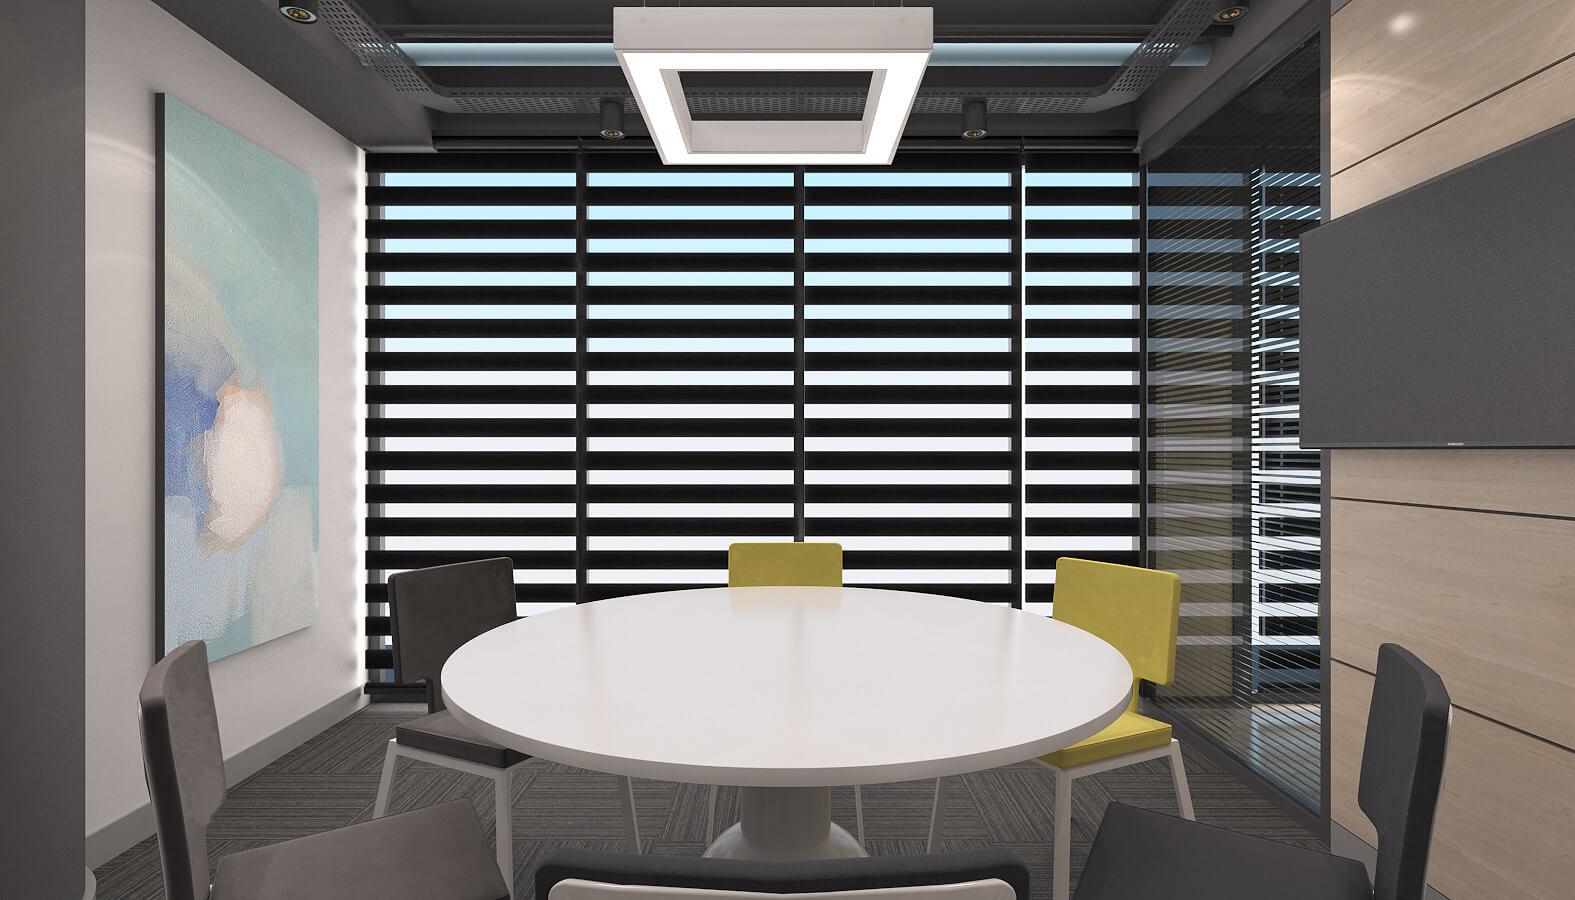 ofis mimari 3634 Artı Entegre Ofisler